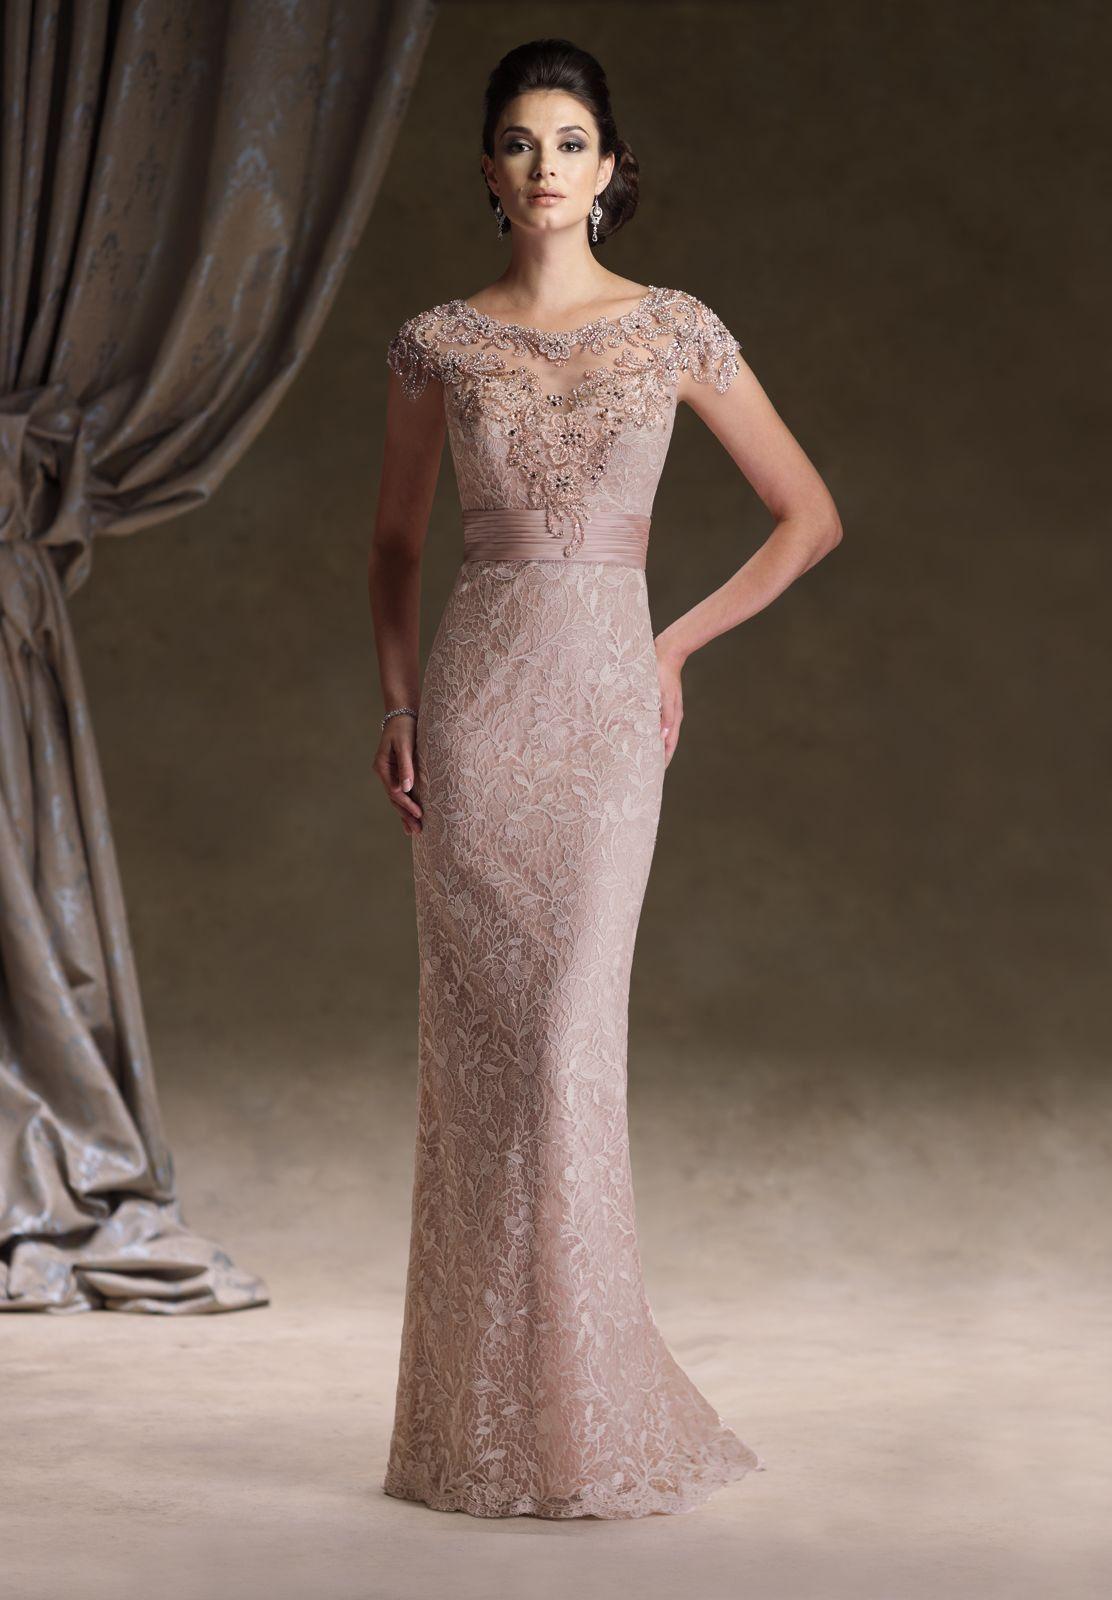 vintage lace gowns | Lace Bateau Sheath Vintage Long Mother of the ...